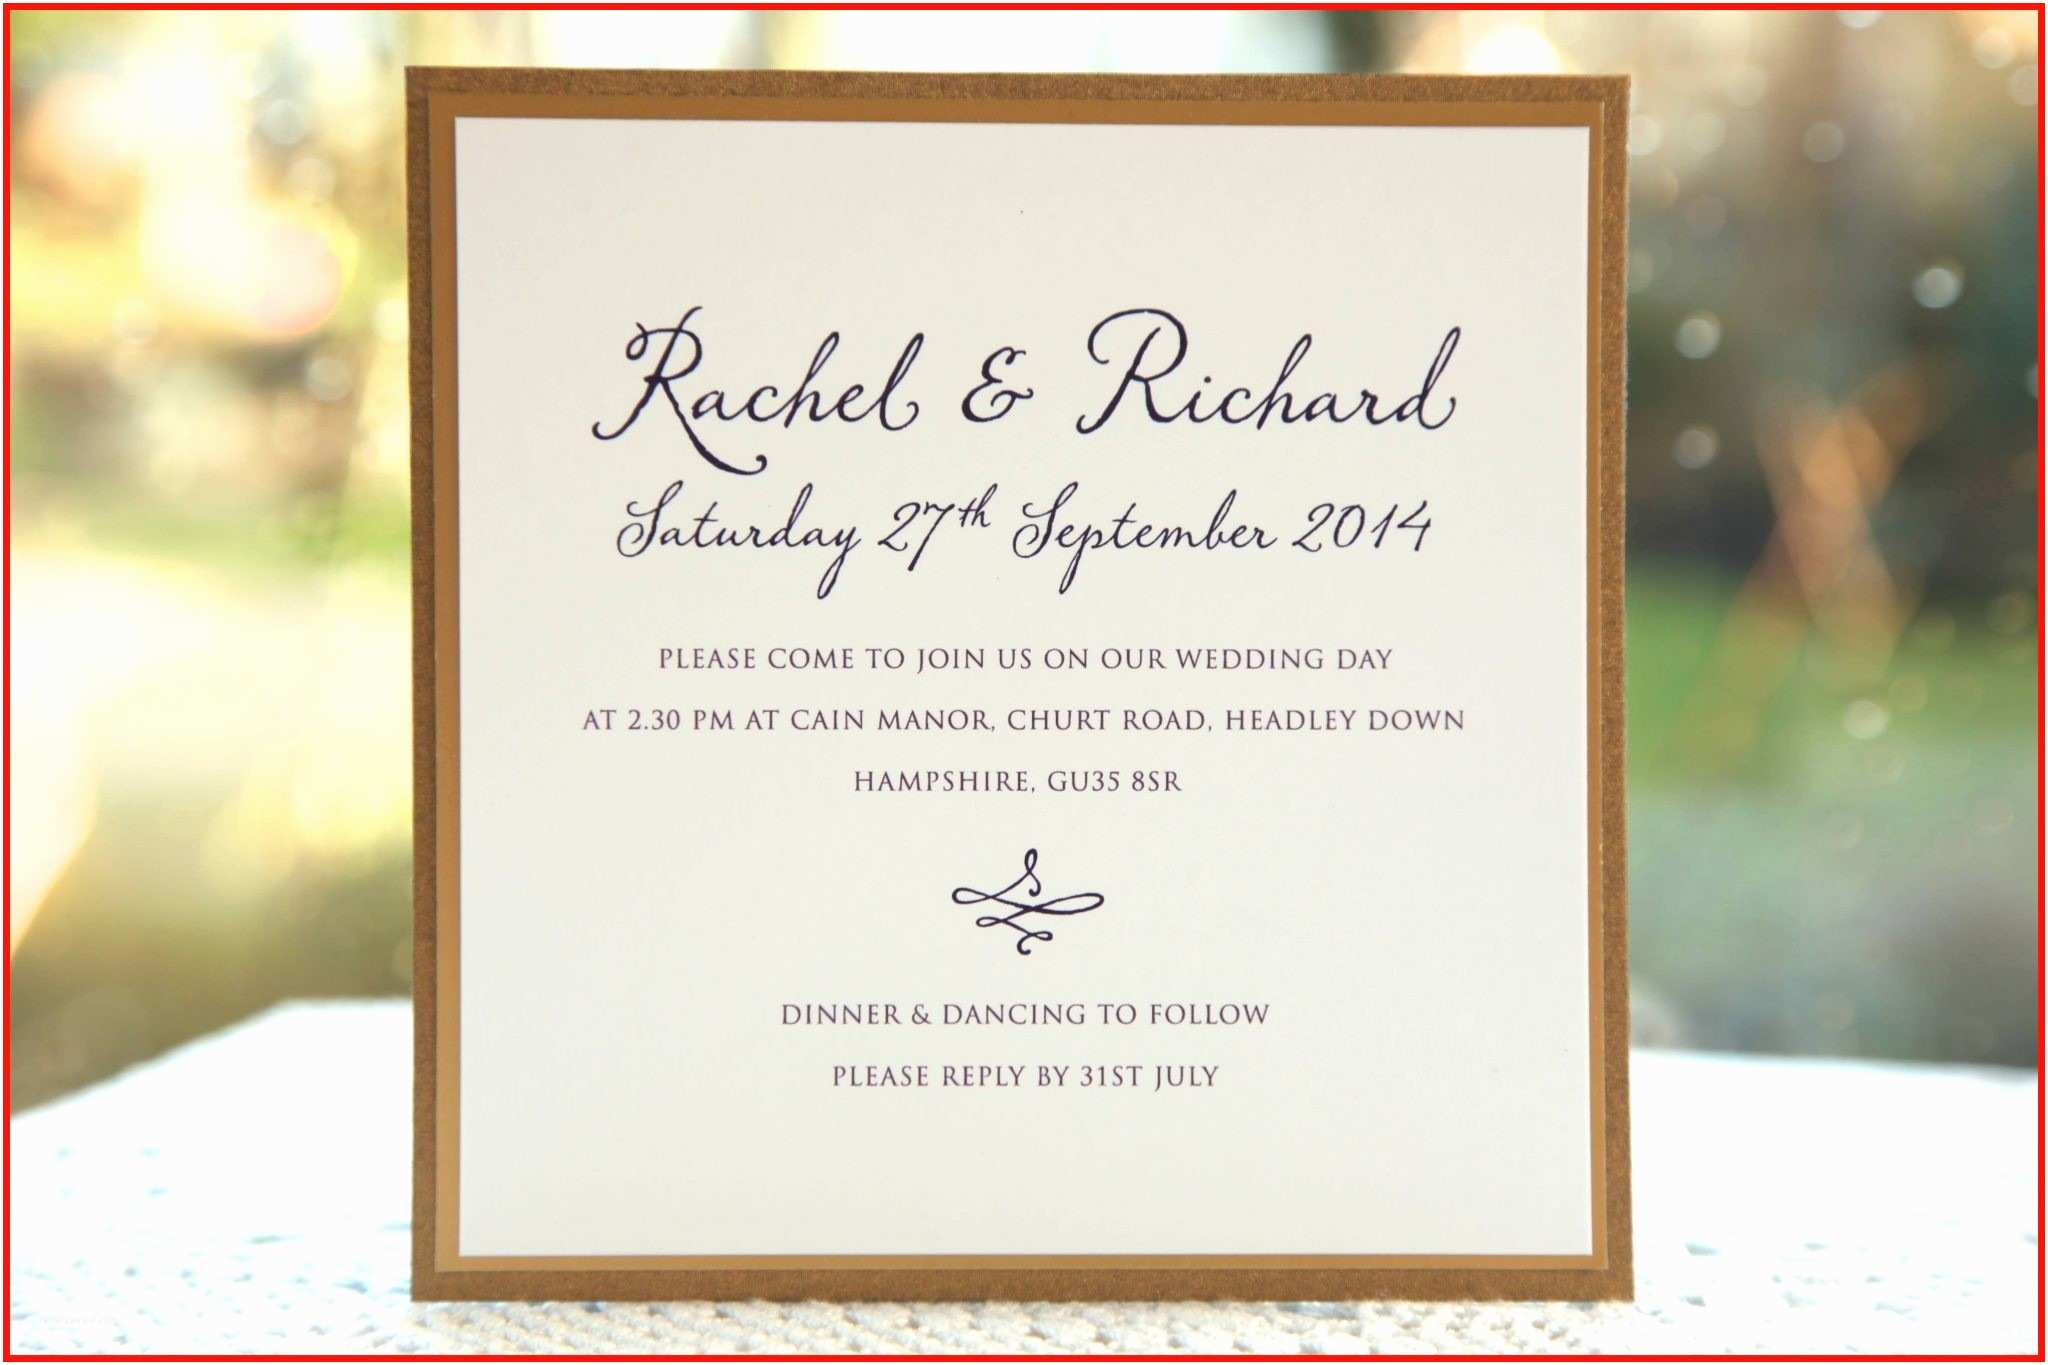 Online Editable Wedding Invitation Cards Free Download Editable Wedding Invitation Cards Free Tierianhenry